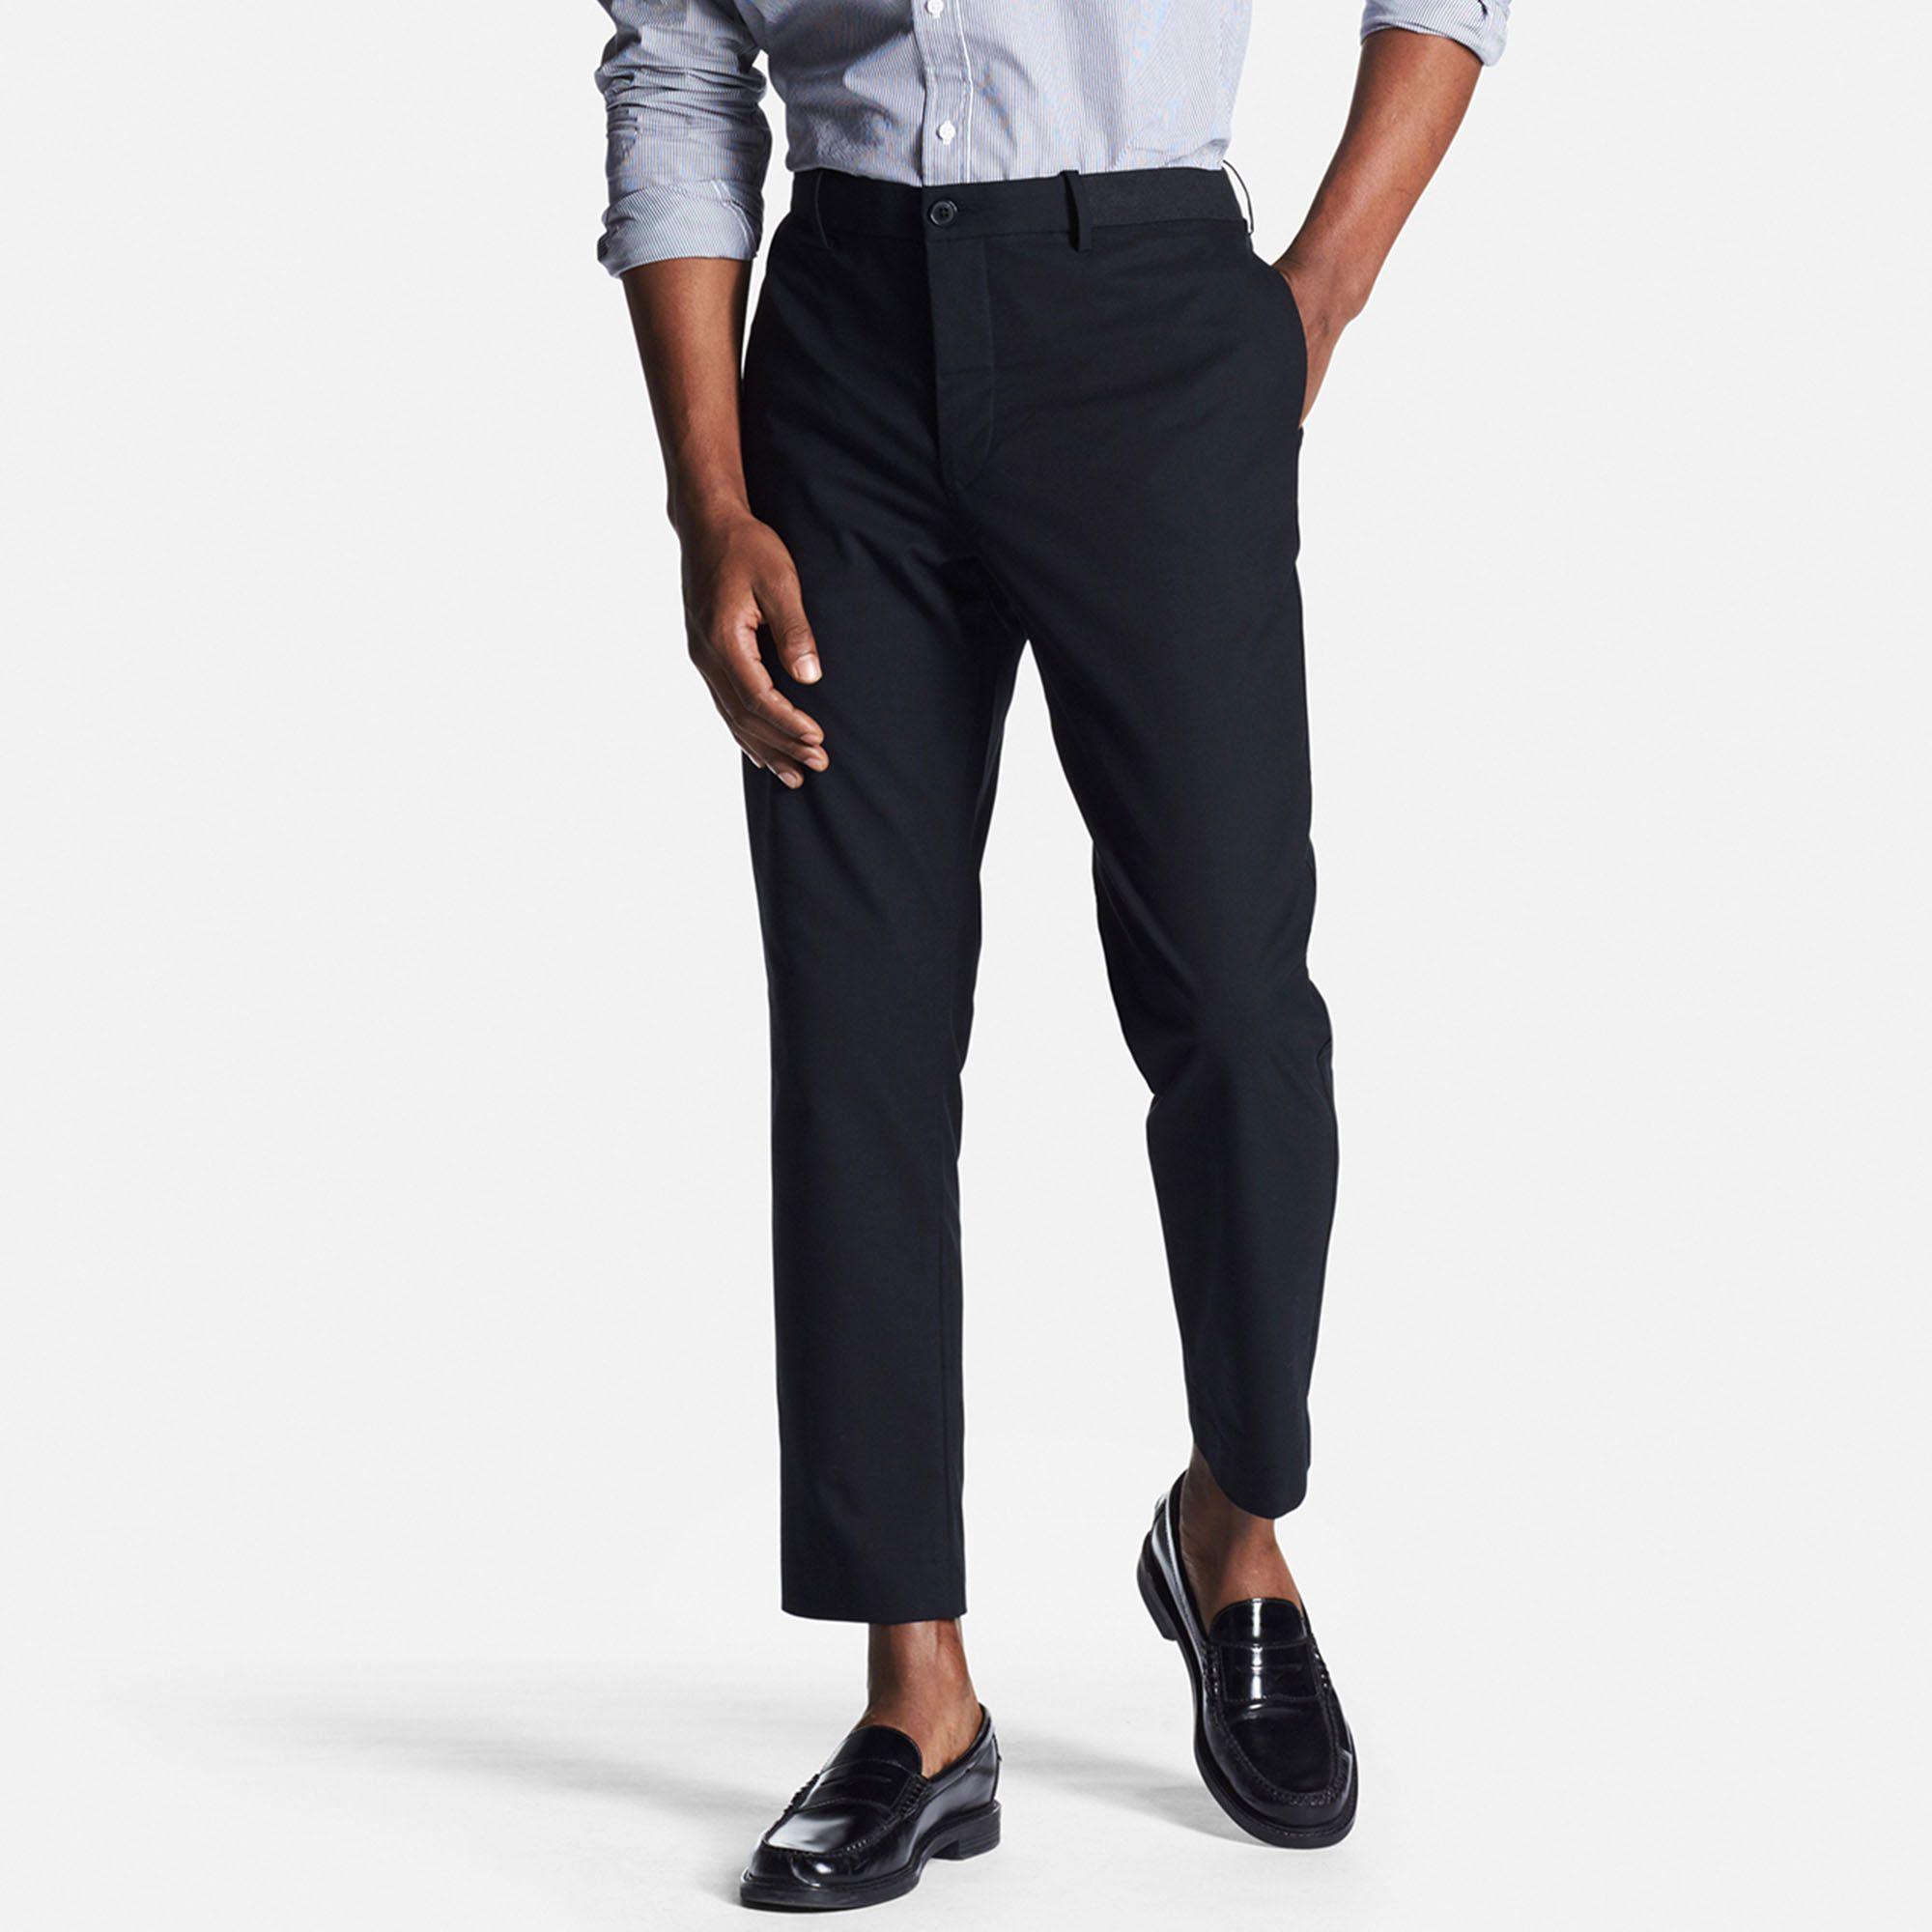 1fa48fec2640 Men relaxed ankle pants (cotton) | Wardrobe | Ankle pants, Pants ...